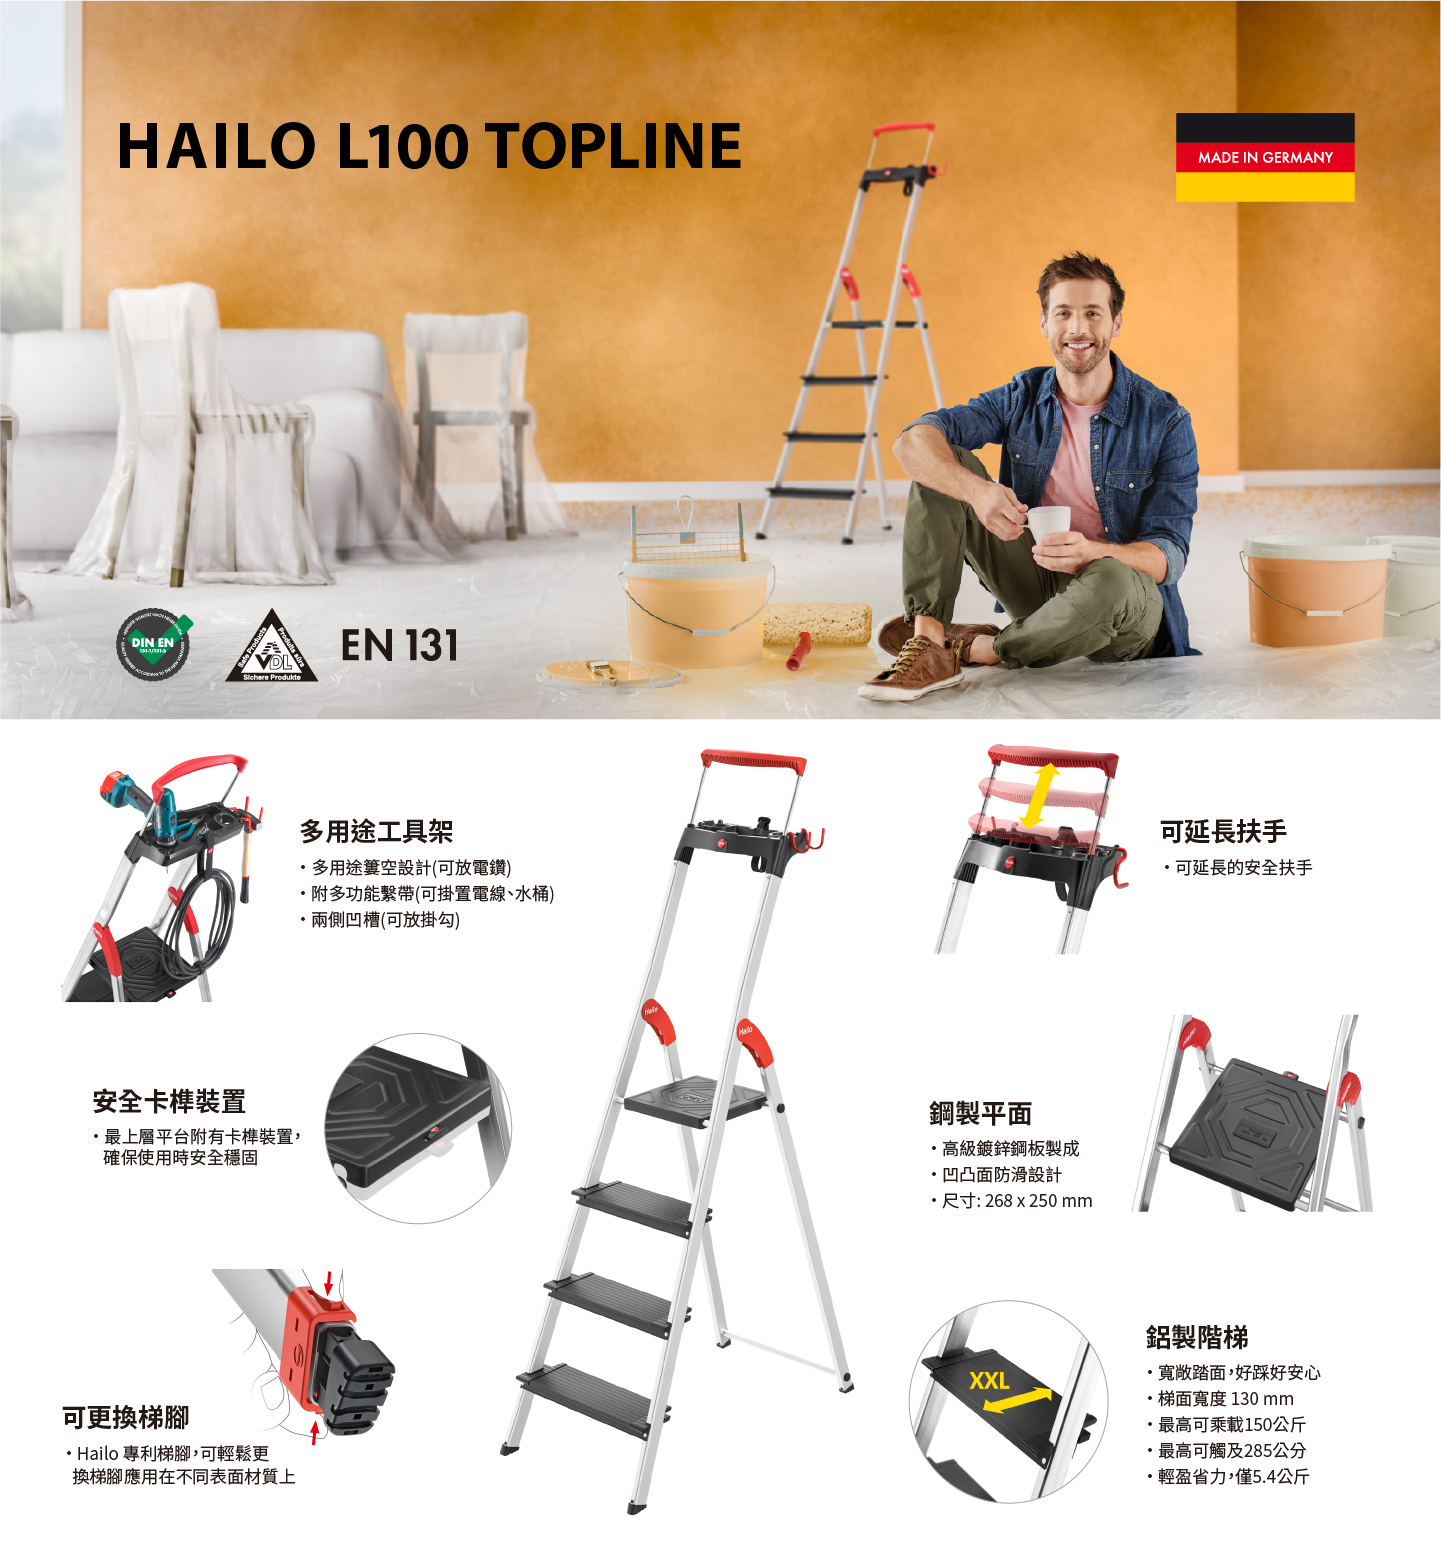 Hailo-L100Topline-4steps